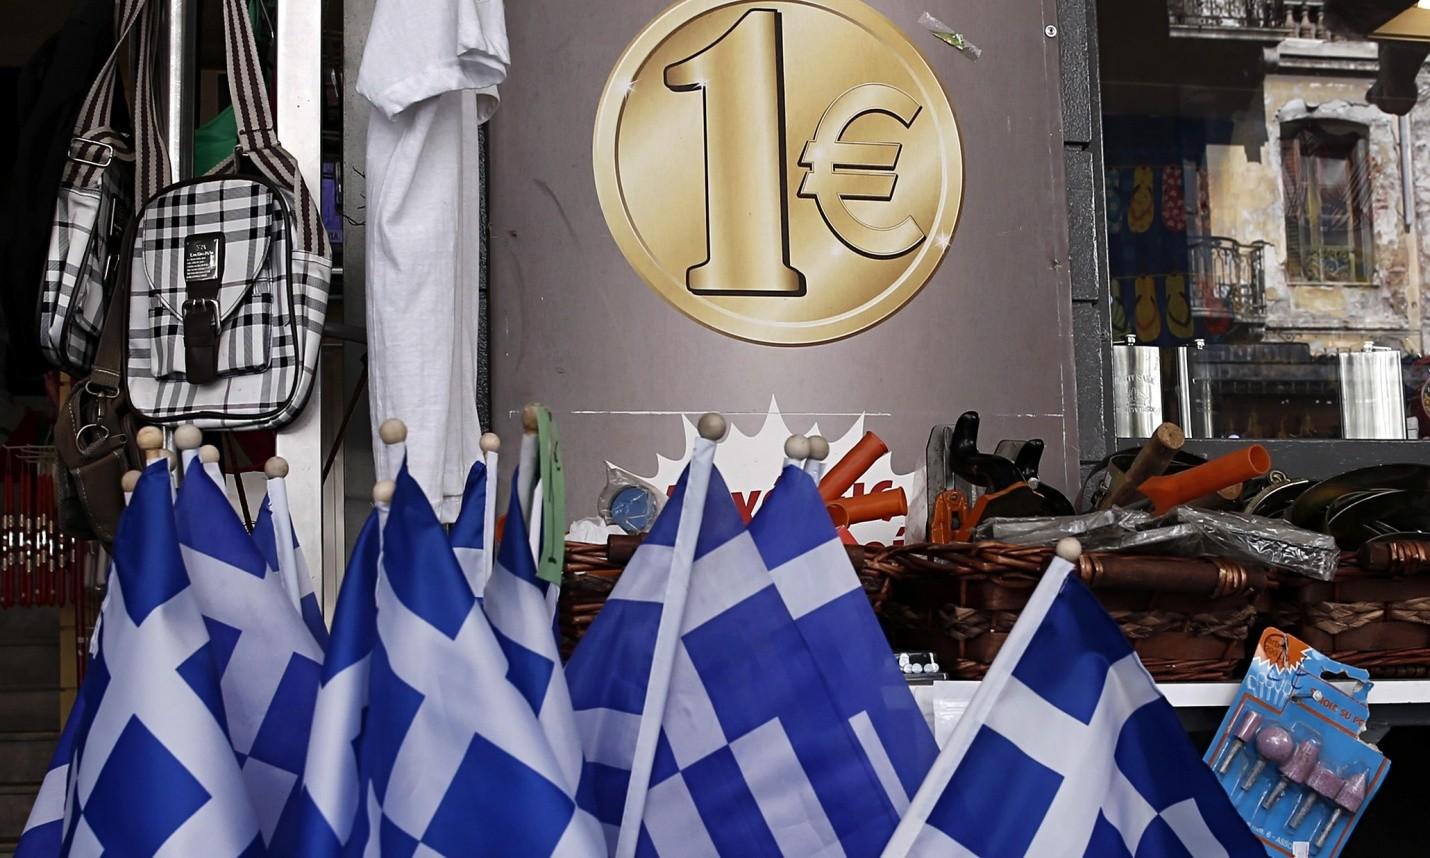 greek-national-flags-are-009.jpg